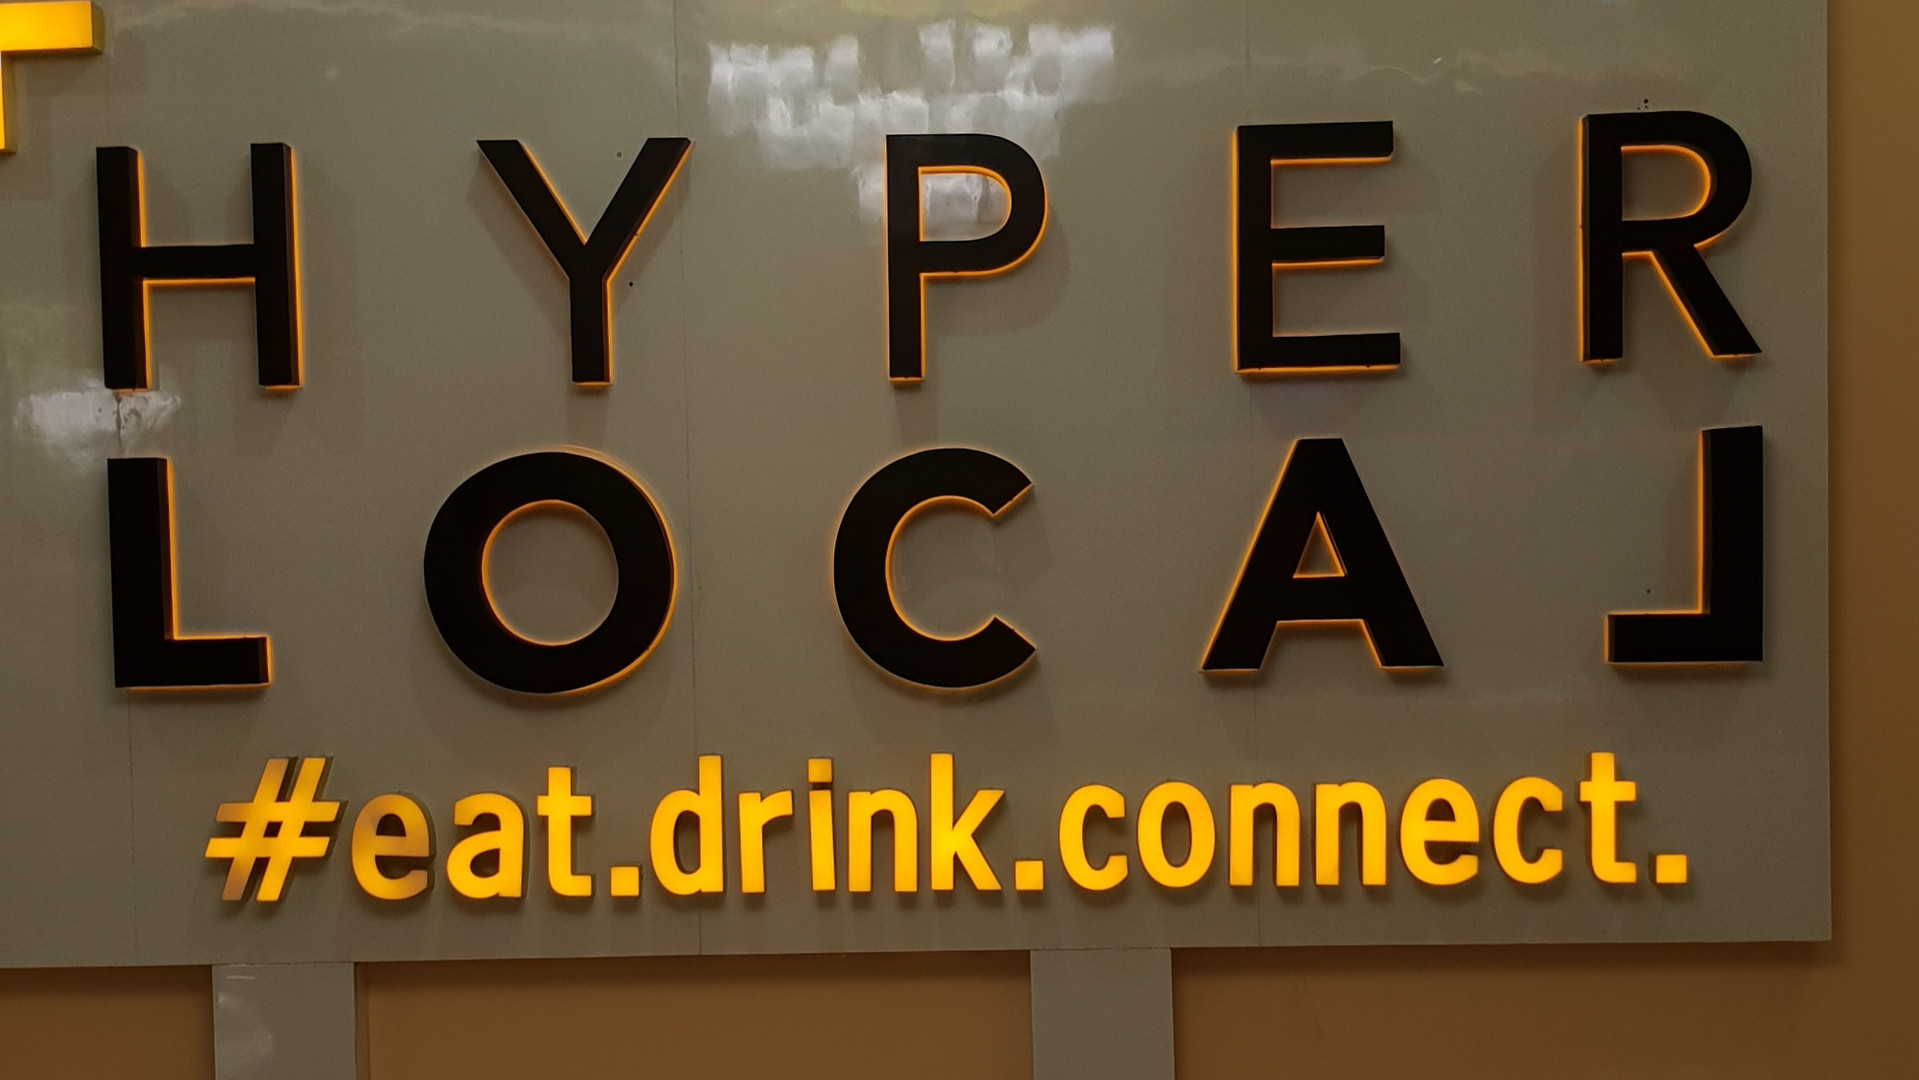 Hyper Local Hyderabad